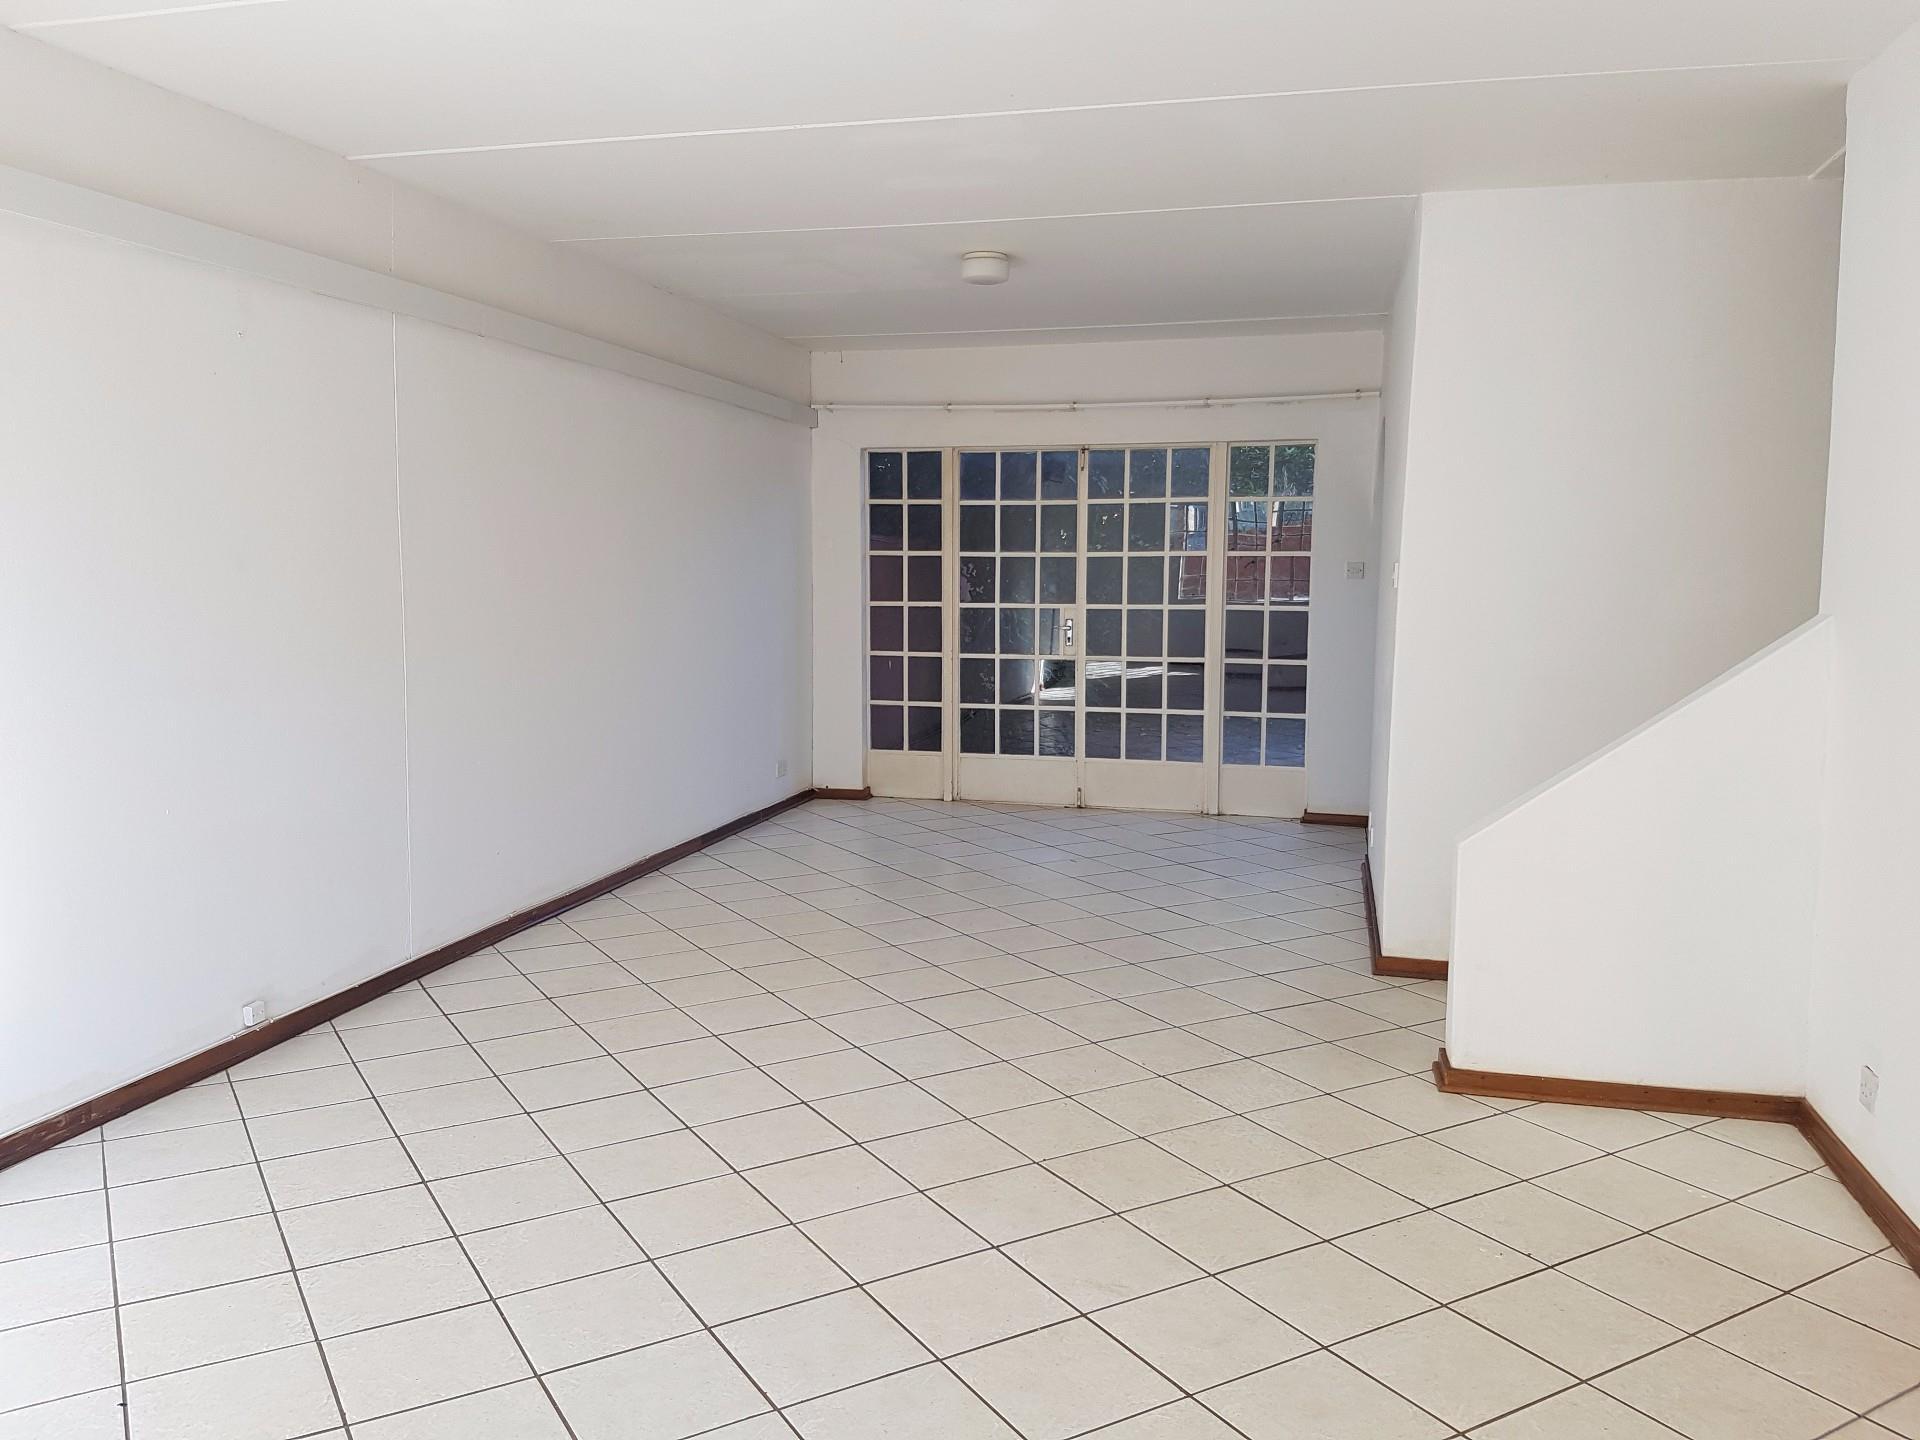 3 Bedroom House To Rent in Phakalane